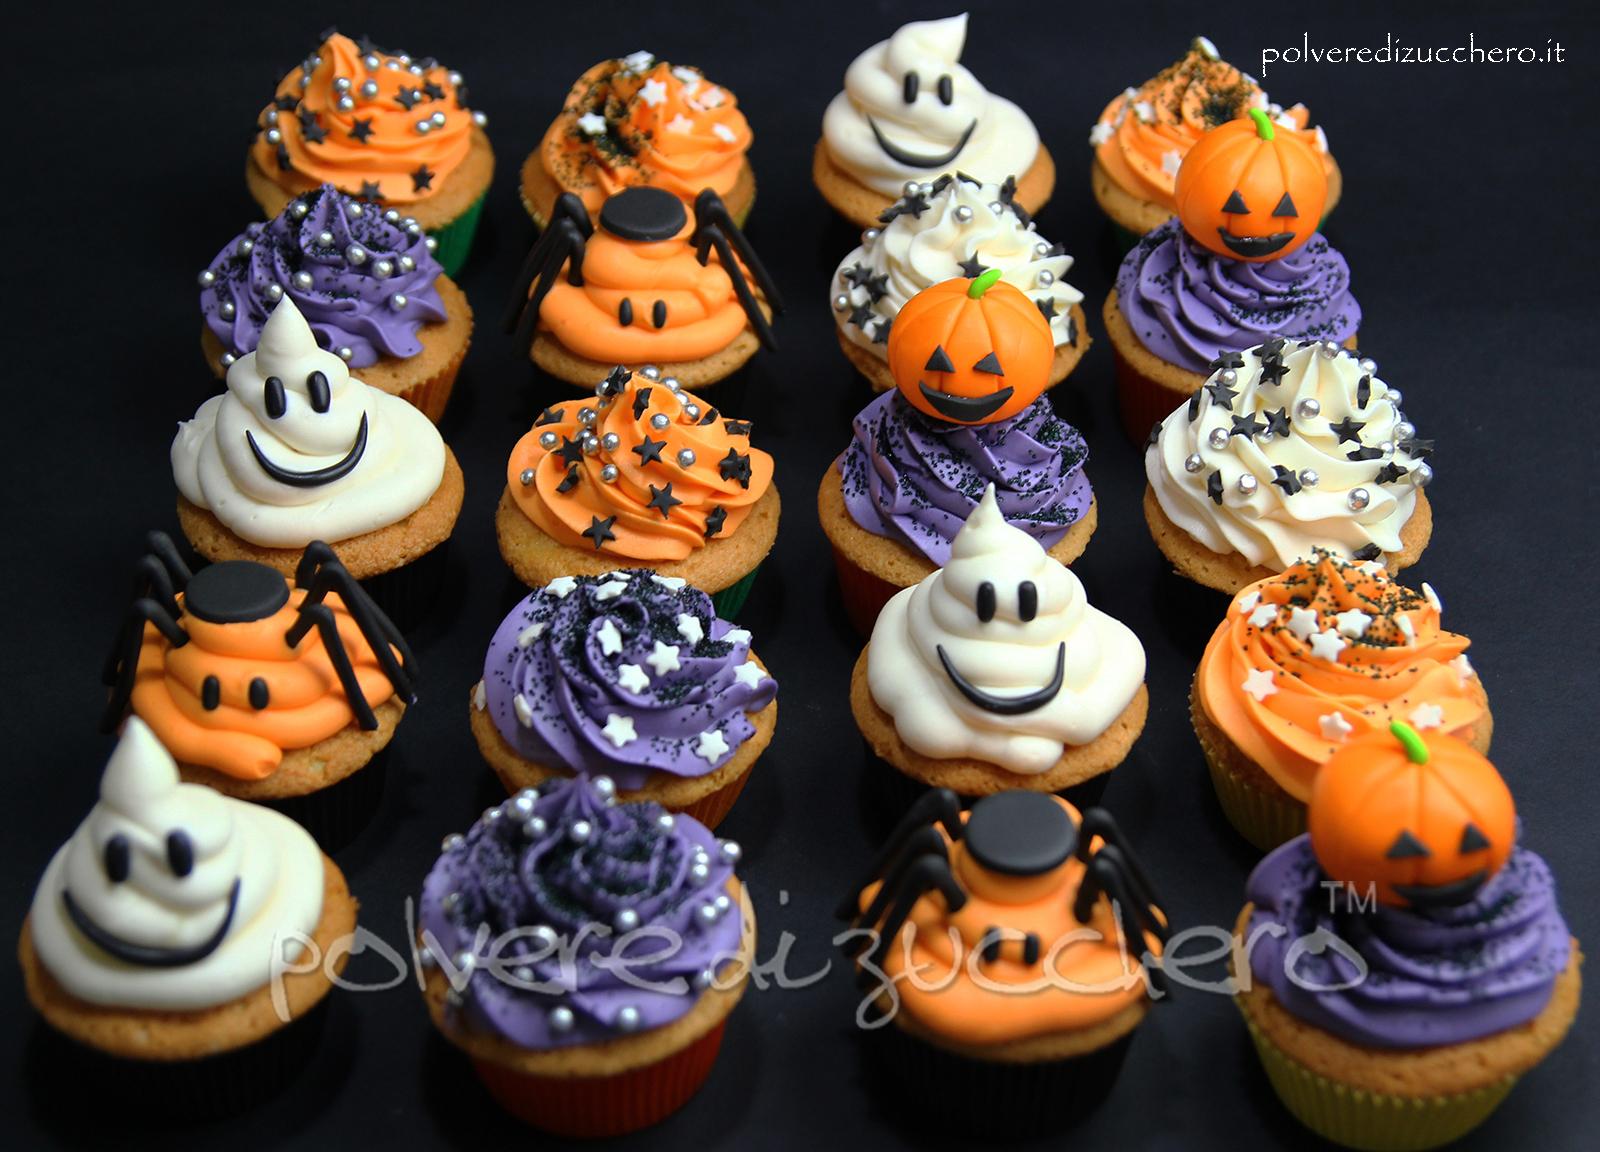 halloween cupcakes cake design frosting pasta di zucchero passo a passo  tutorial 6b1fb8329c96